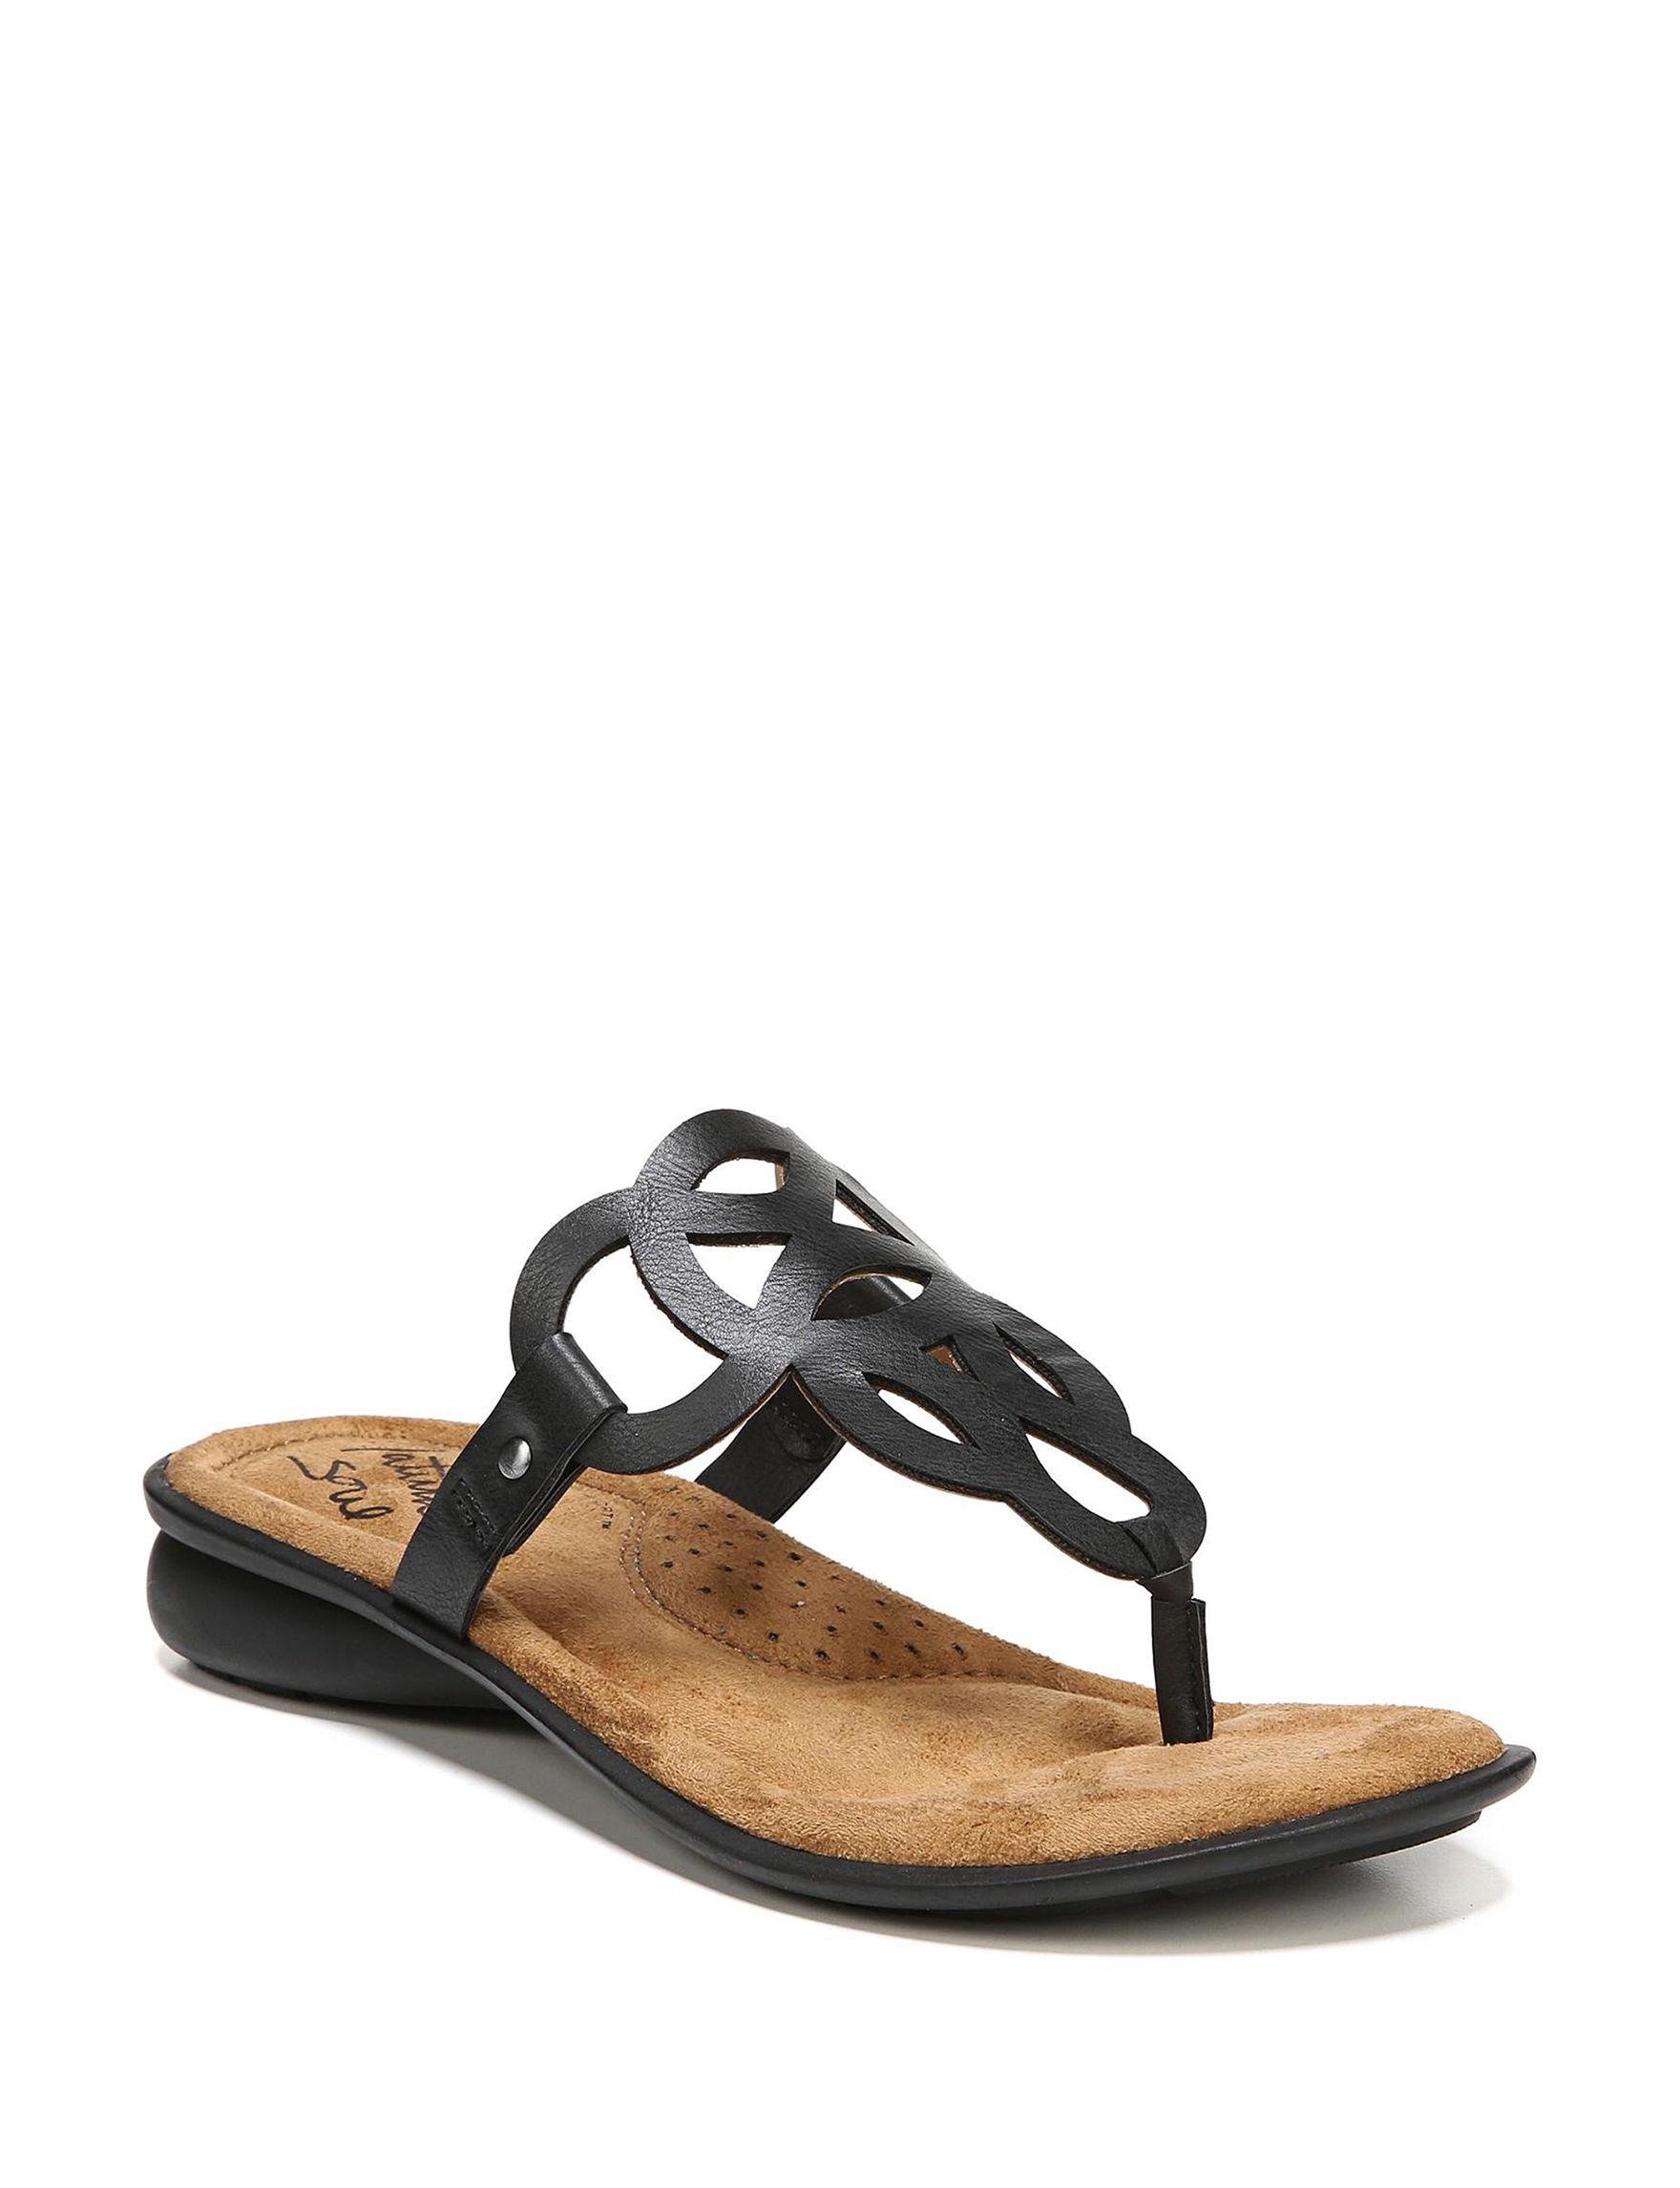 Soul Naturalizer Black Flat Sandals